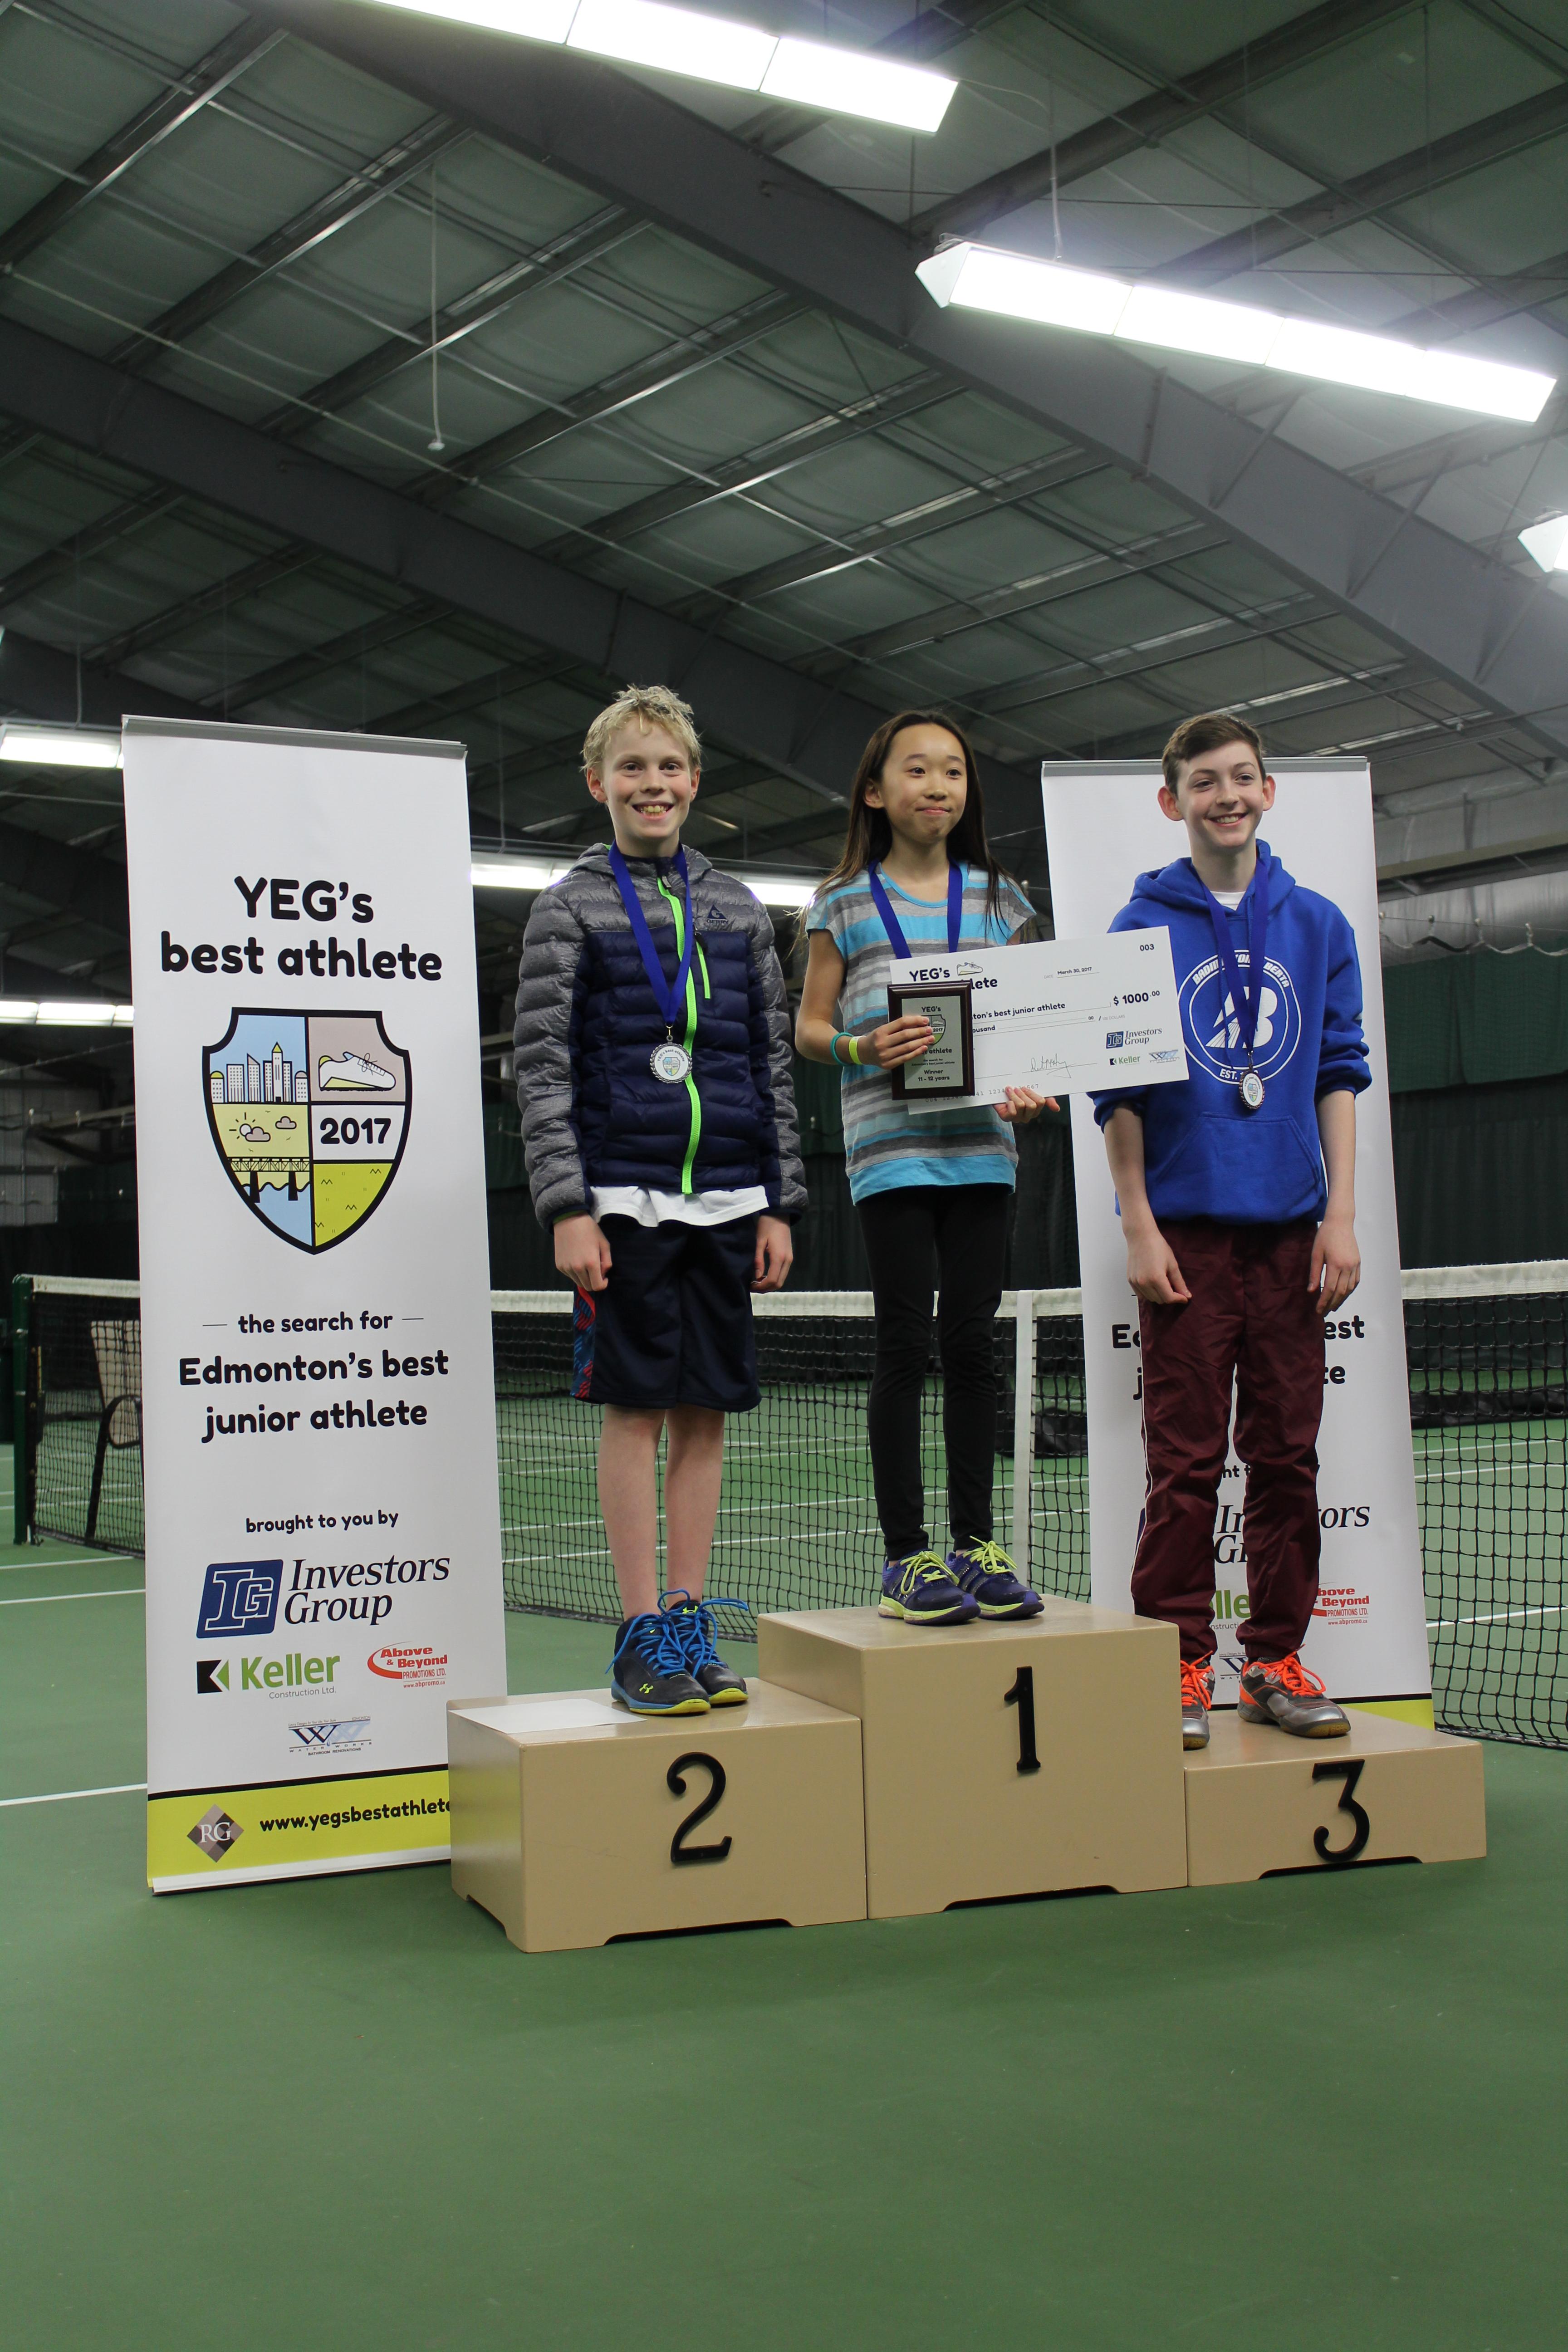 11-12-year-old winners